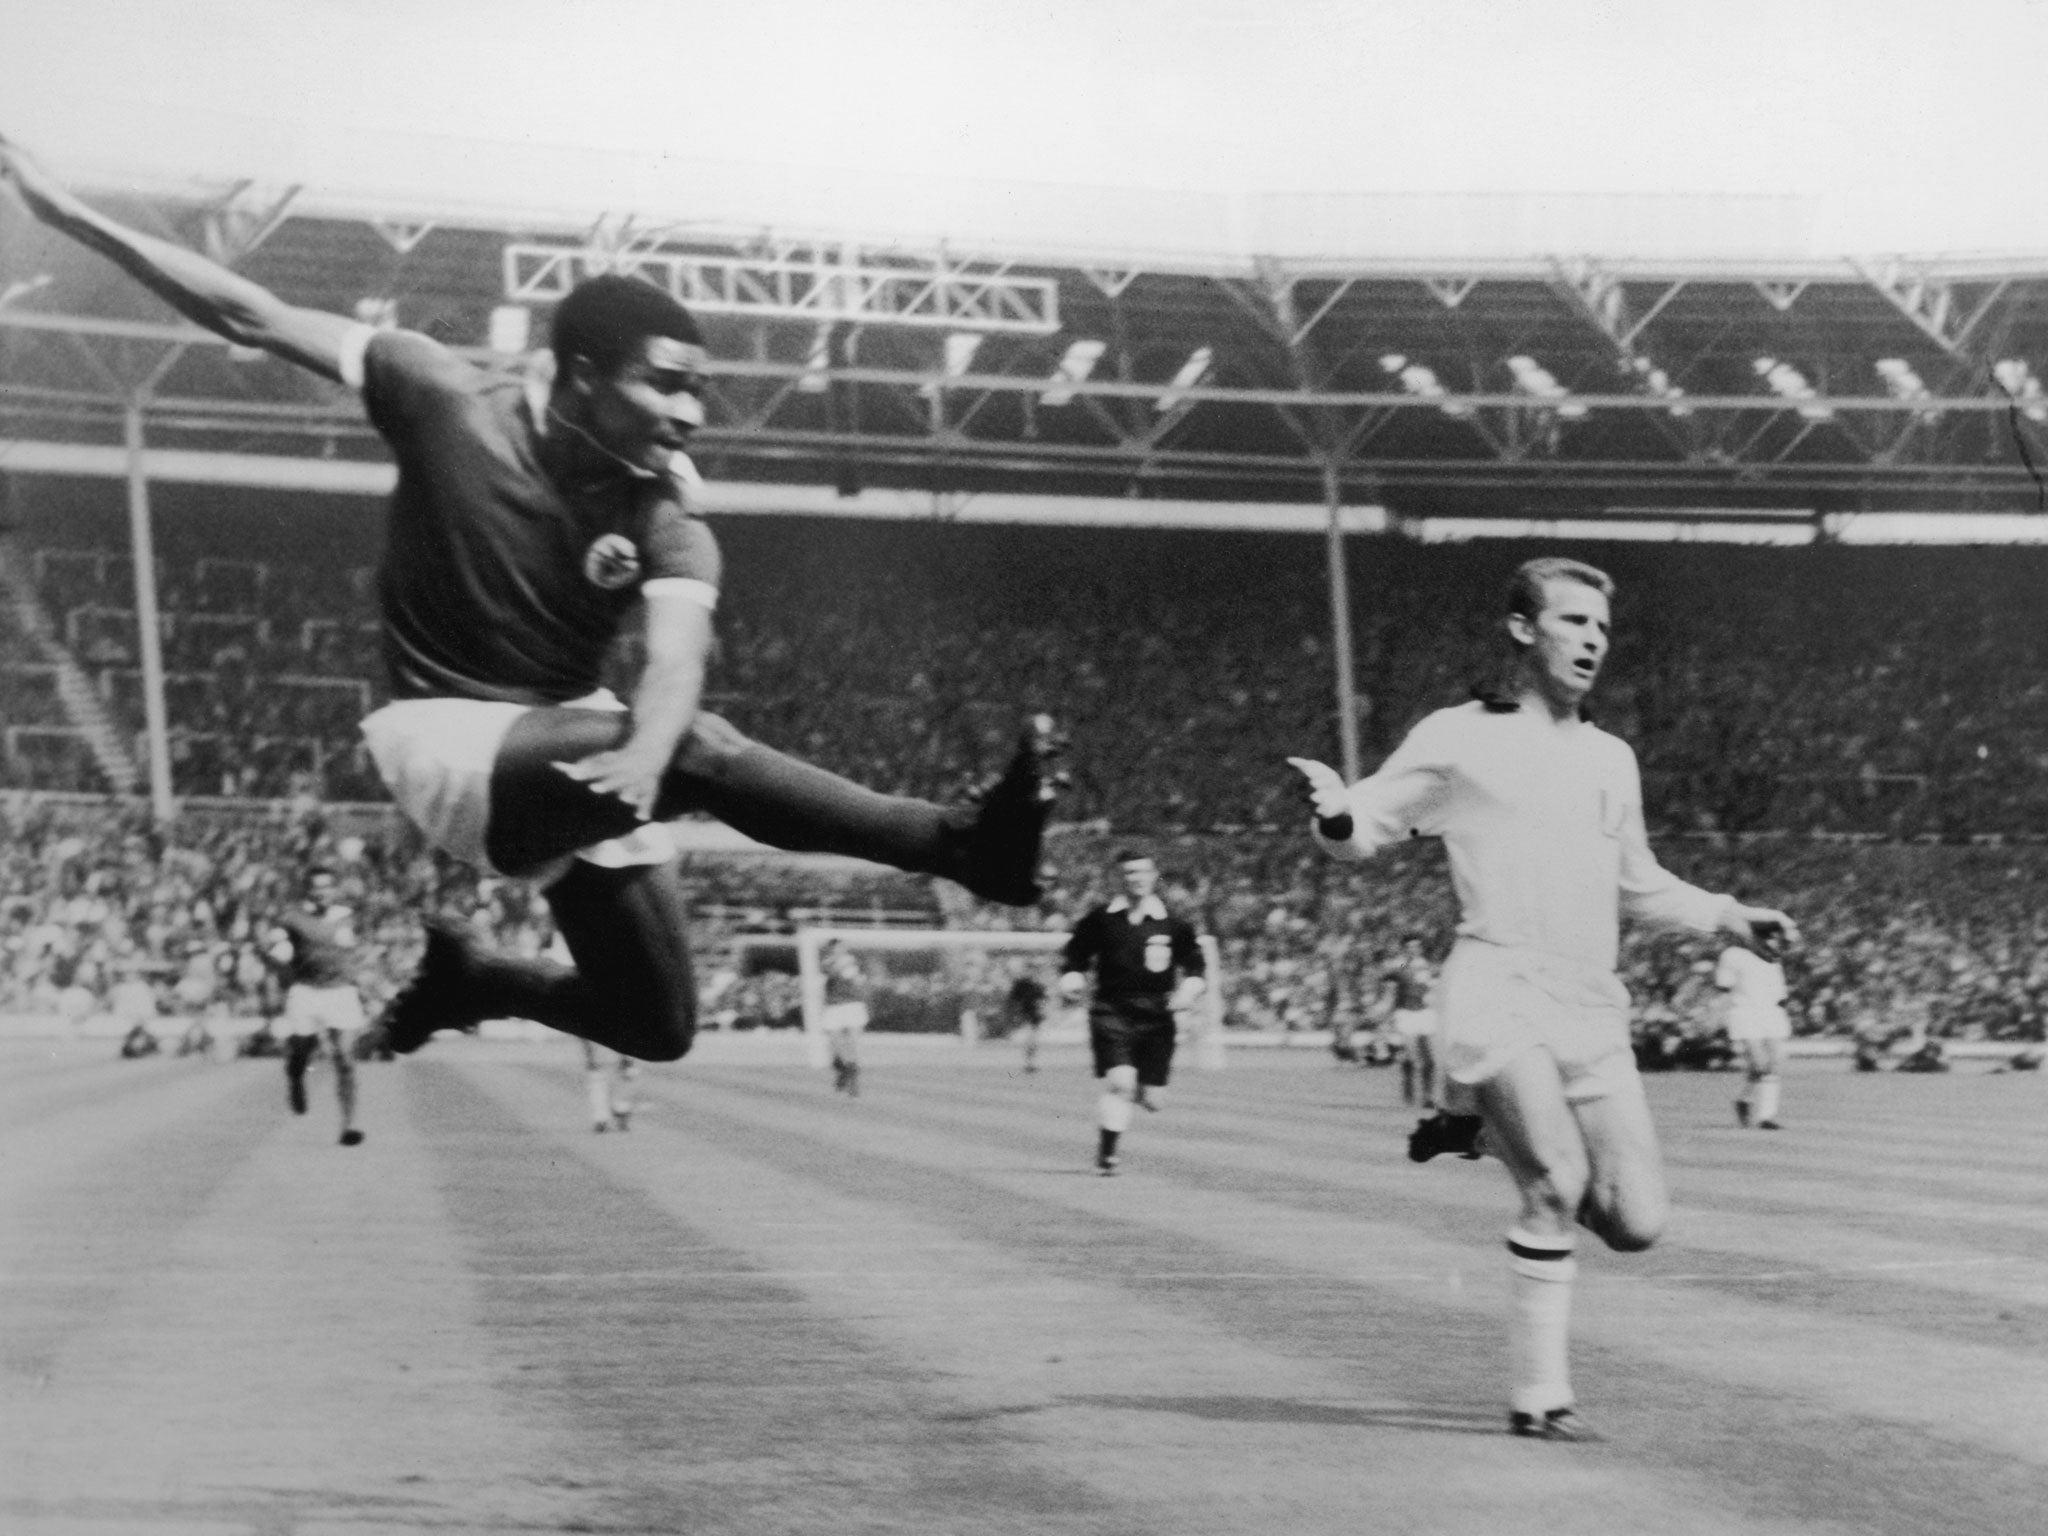 World mourns Eusebio whose goals won English hearts in 66